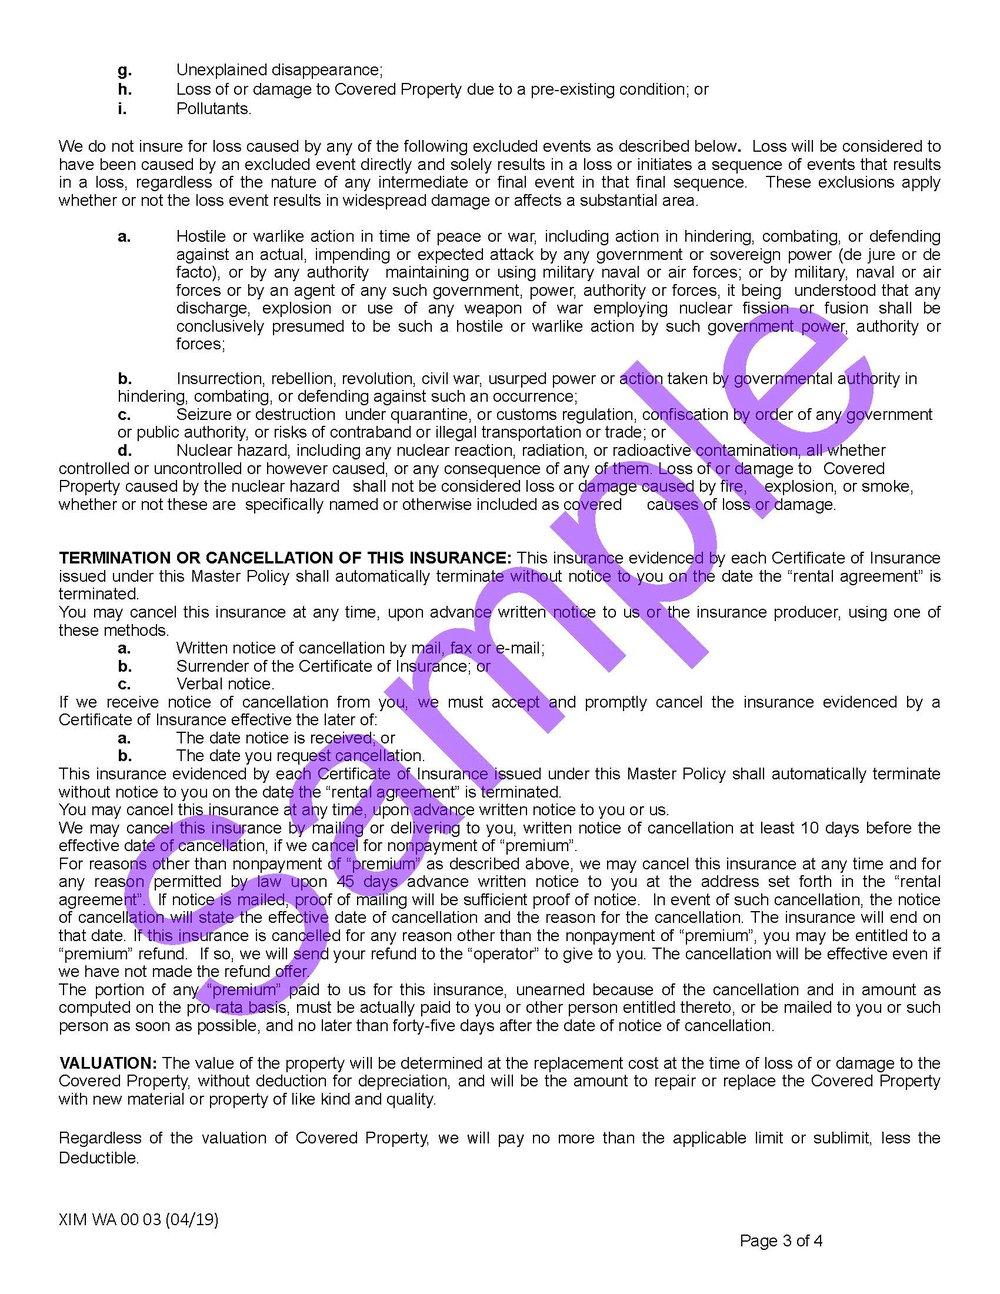 XIM WA 00 03 04 19 Washington Certificate of InsuranceSample_Page_3.jpg